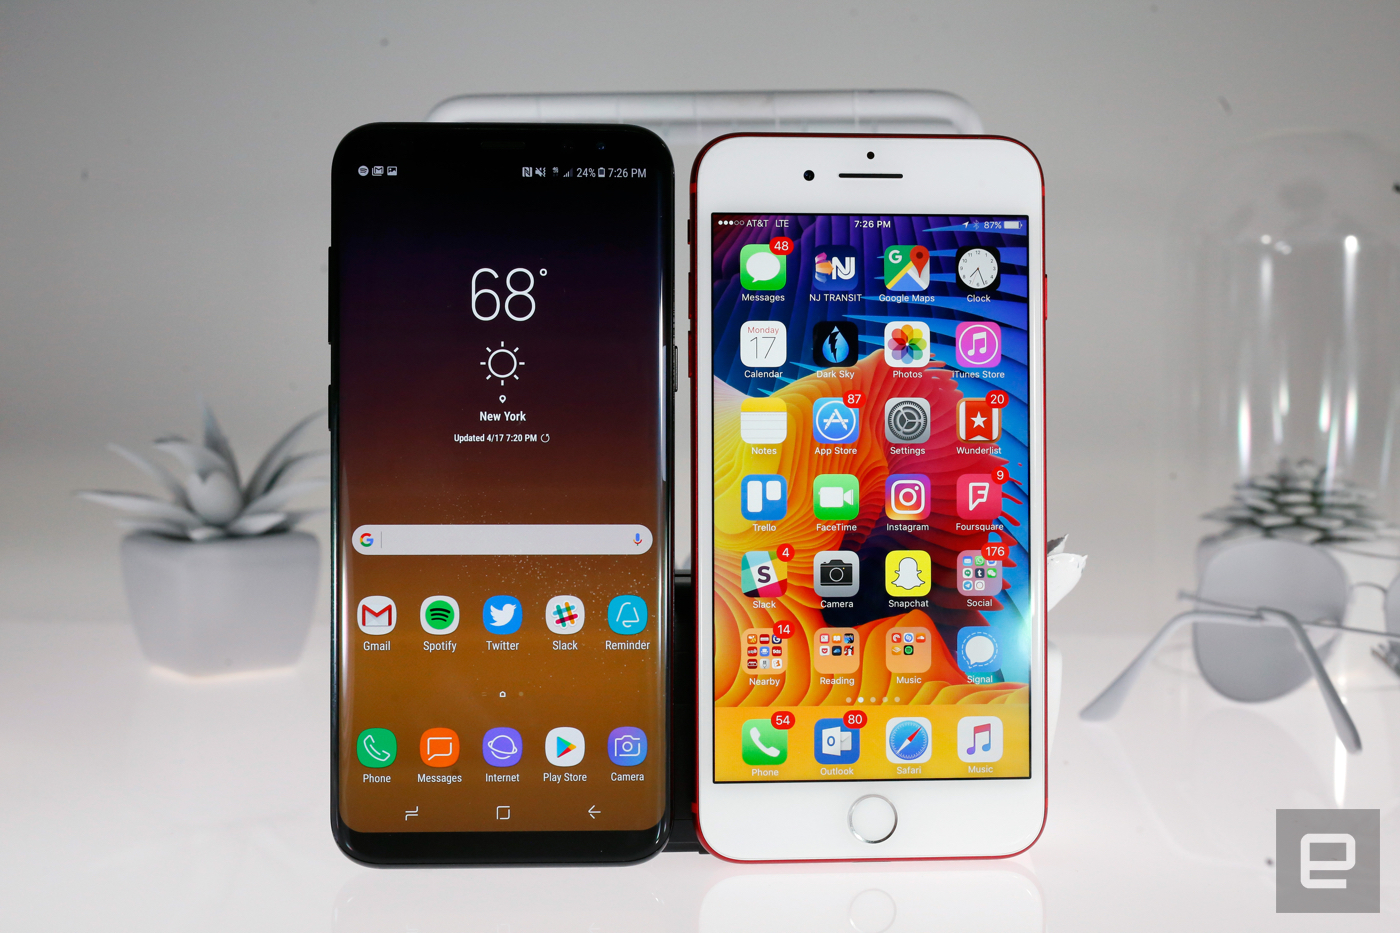 Pubg Wallpaper Samsung S8: Galaxy Note 8とGalaxy S8+、iPhone 7 Plus仕様比較。デュアルカメラは両方光学手ぶれ